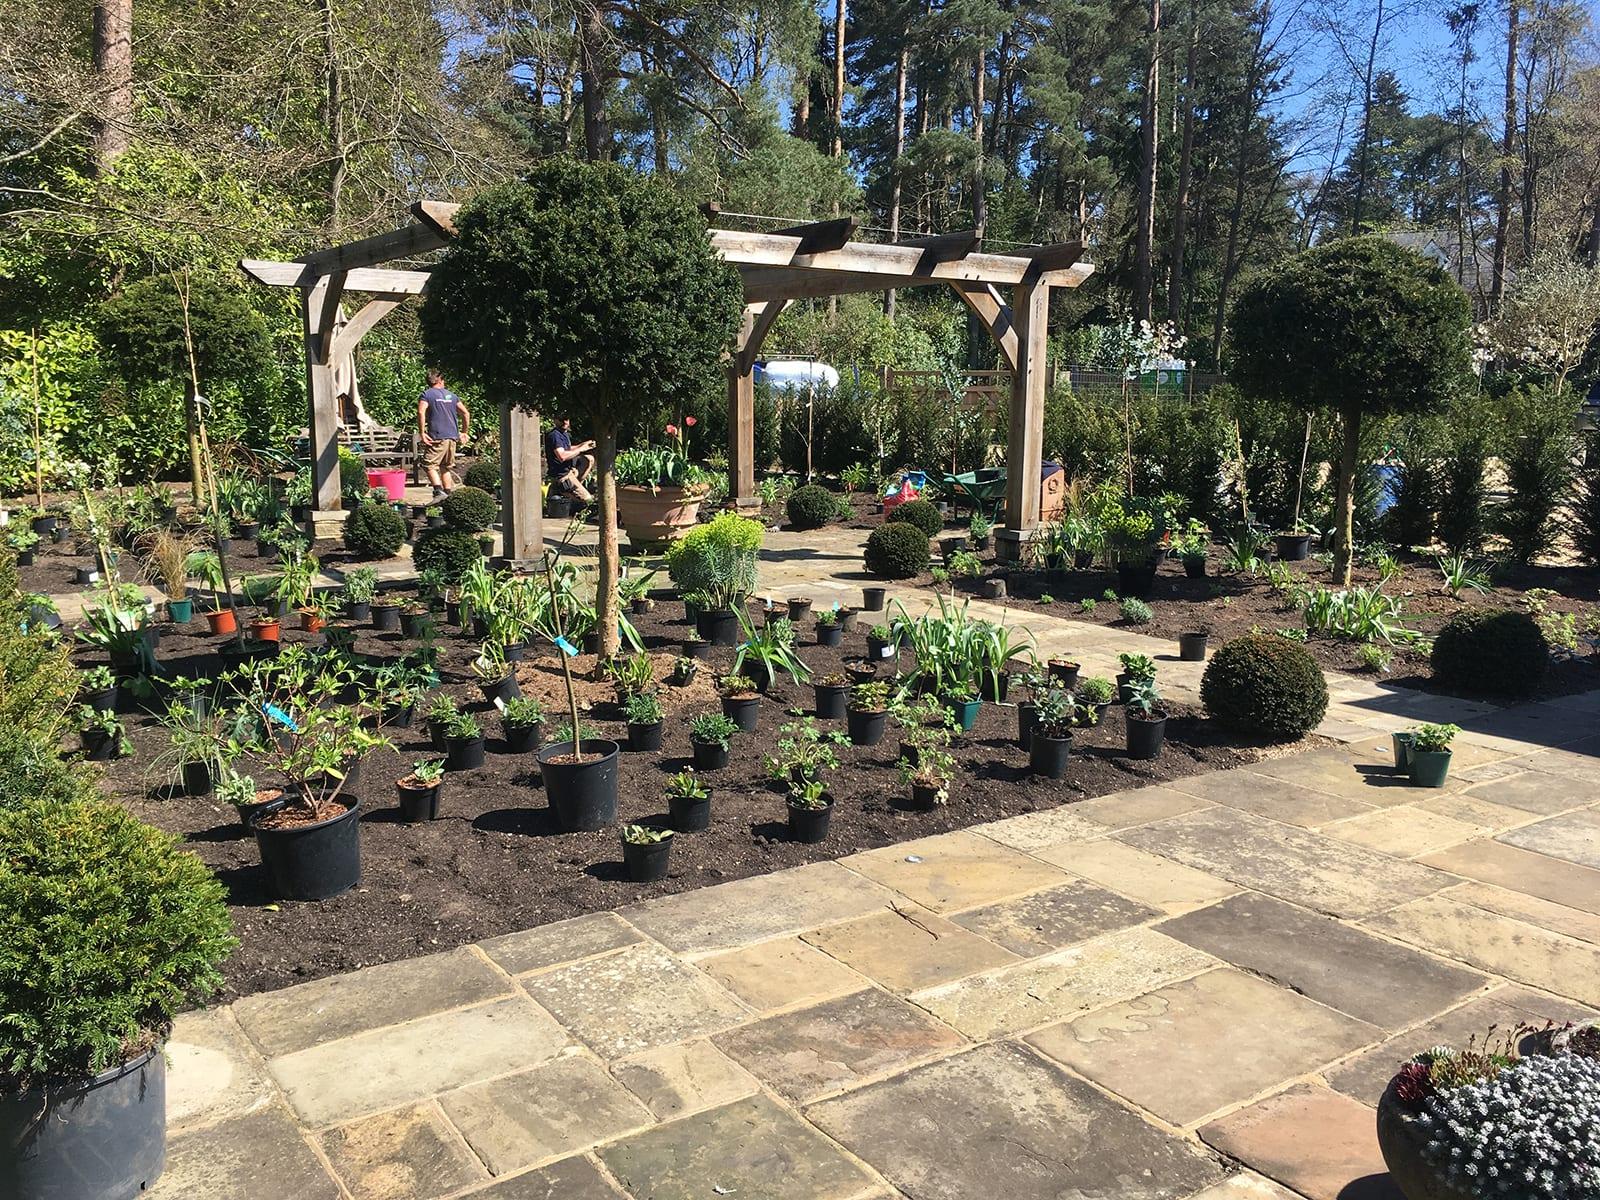 Bushy Business Gardening - Soft Landscaping